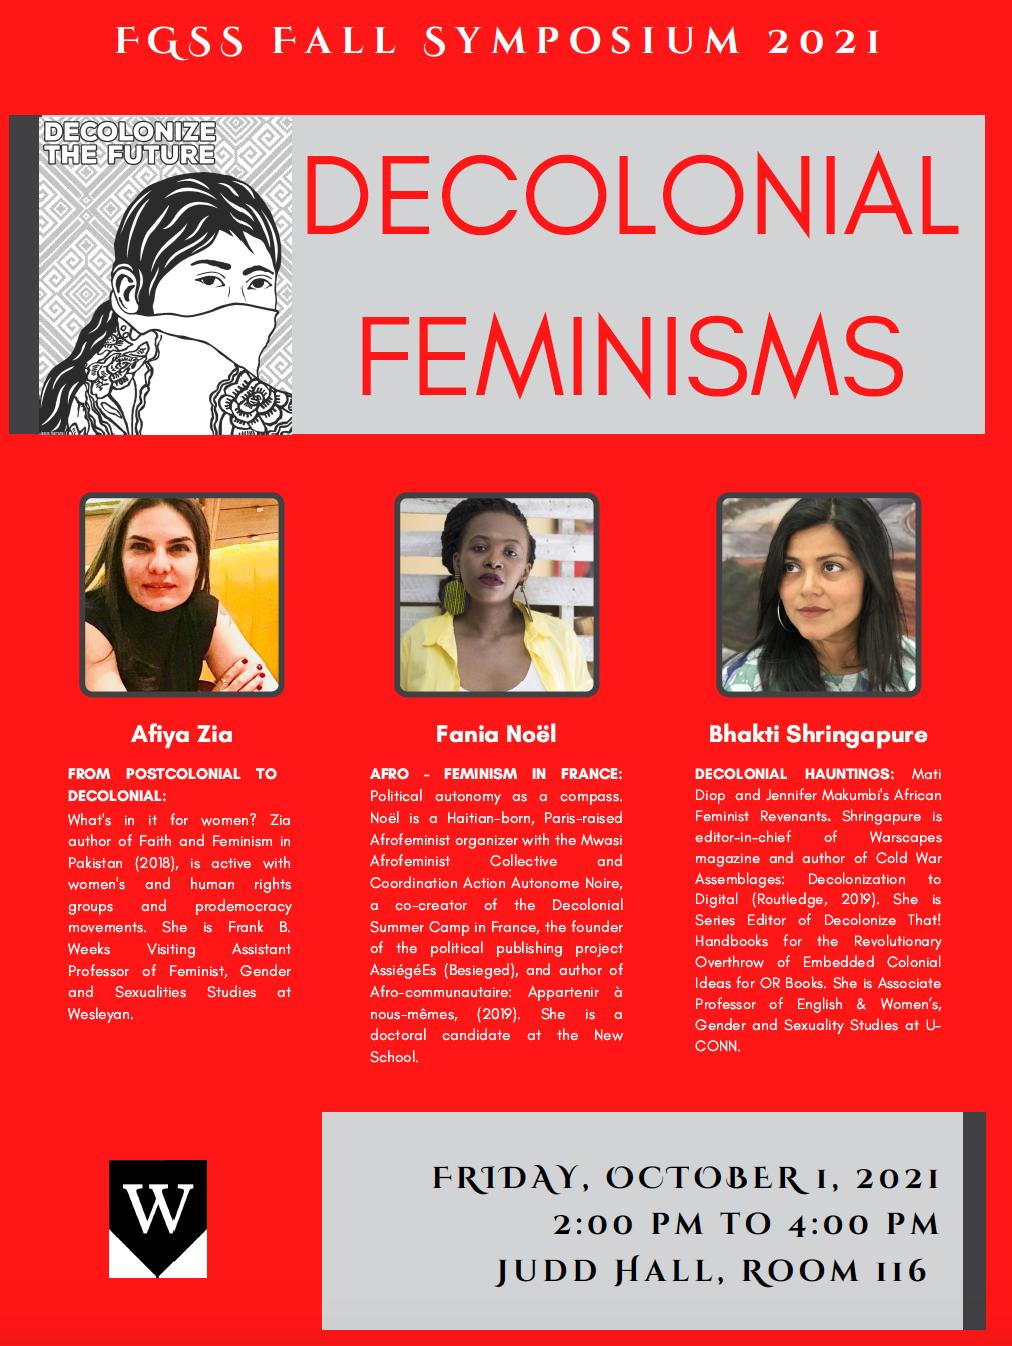 FGSS Fall Symposium: Decolonial Feminisms